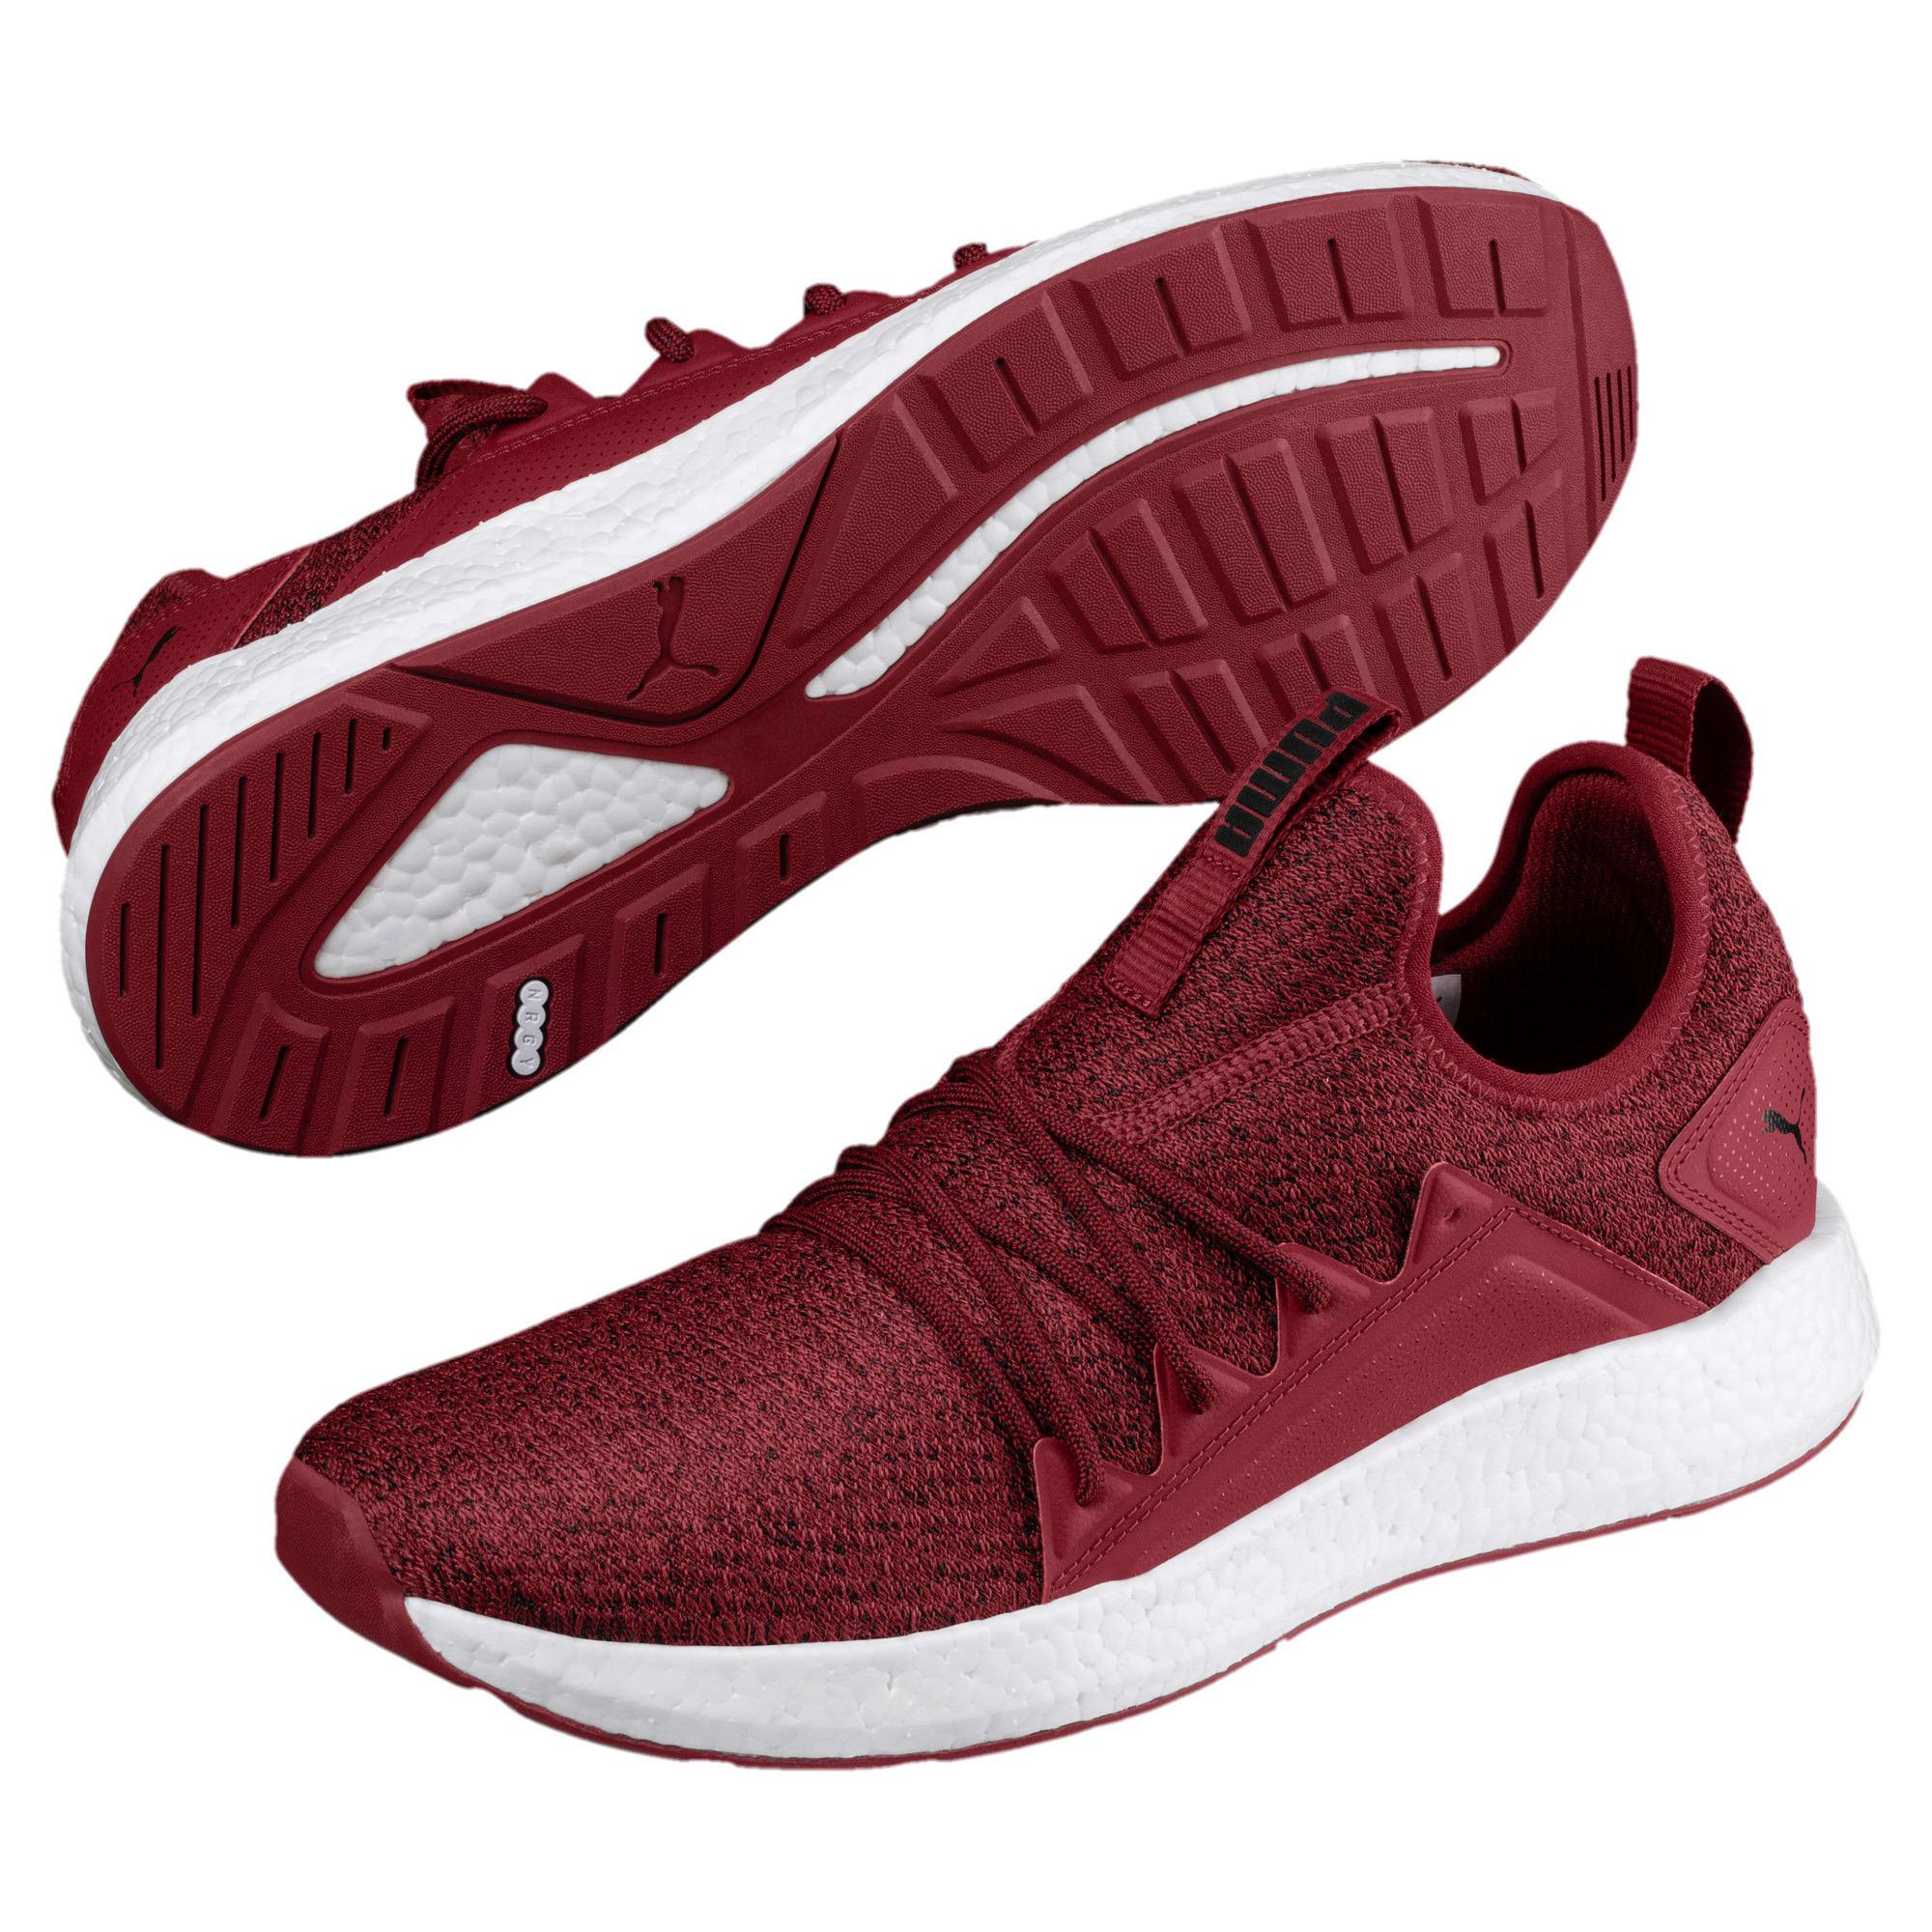 Thumbnail 2 of NRGY Neko Knit Men's Running Shoes, Pomegranate-Puma Black, medium